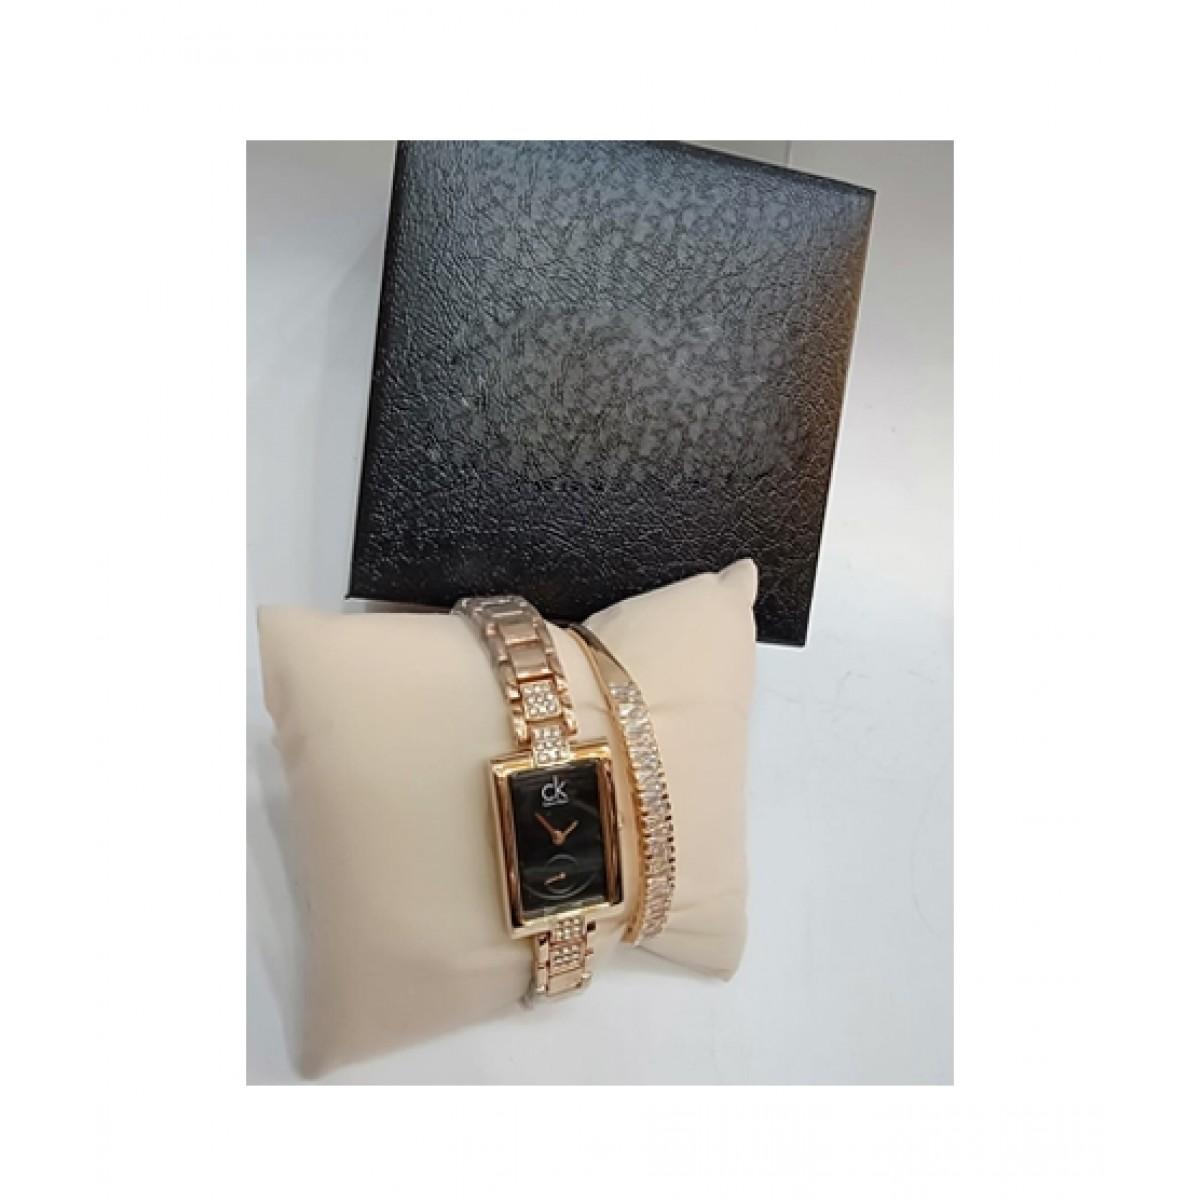 KK Accessories Watch & Bracelet For Women Rose Gold (0614)